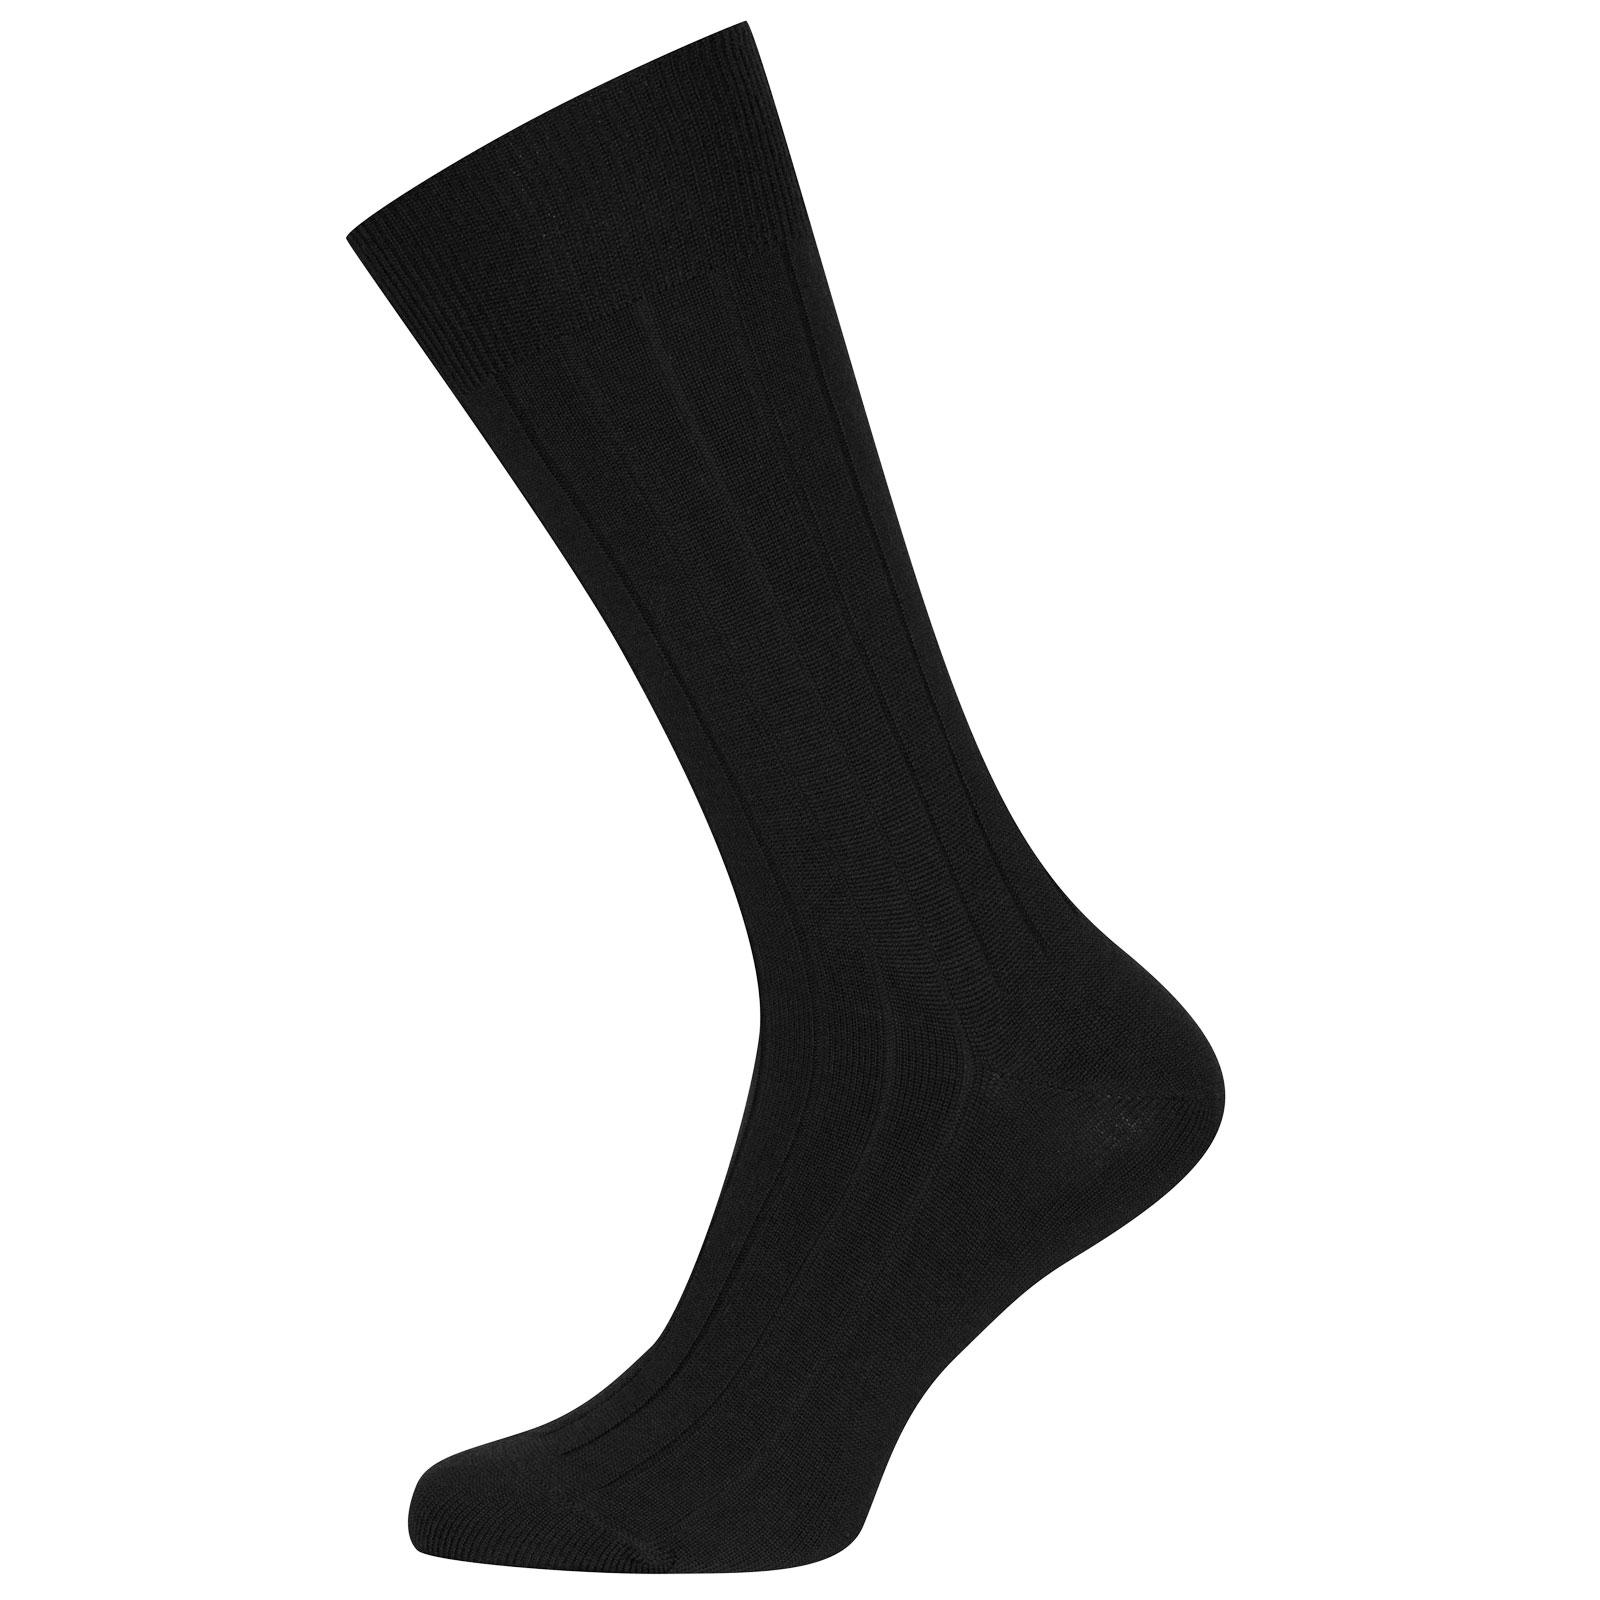 John Smedley Omega Merino Wool Socks in Black-M/L